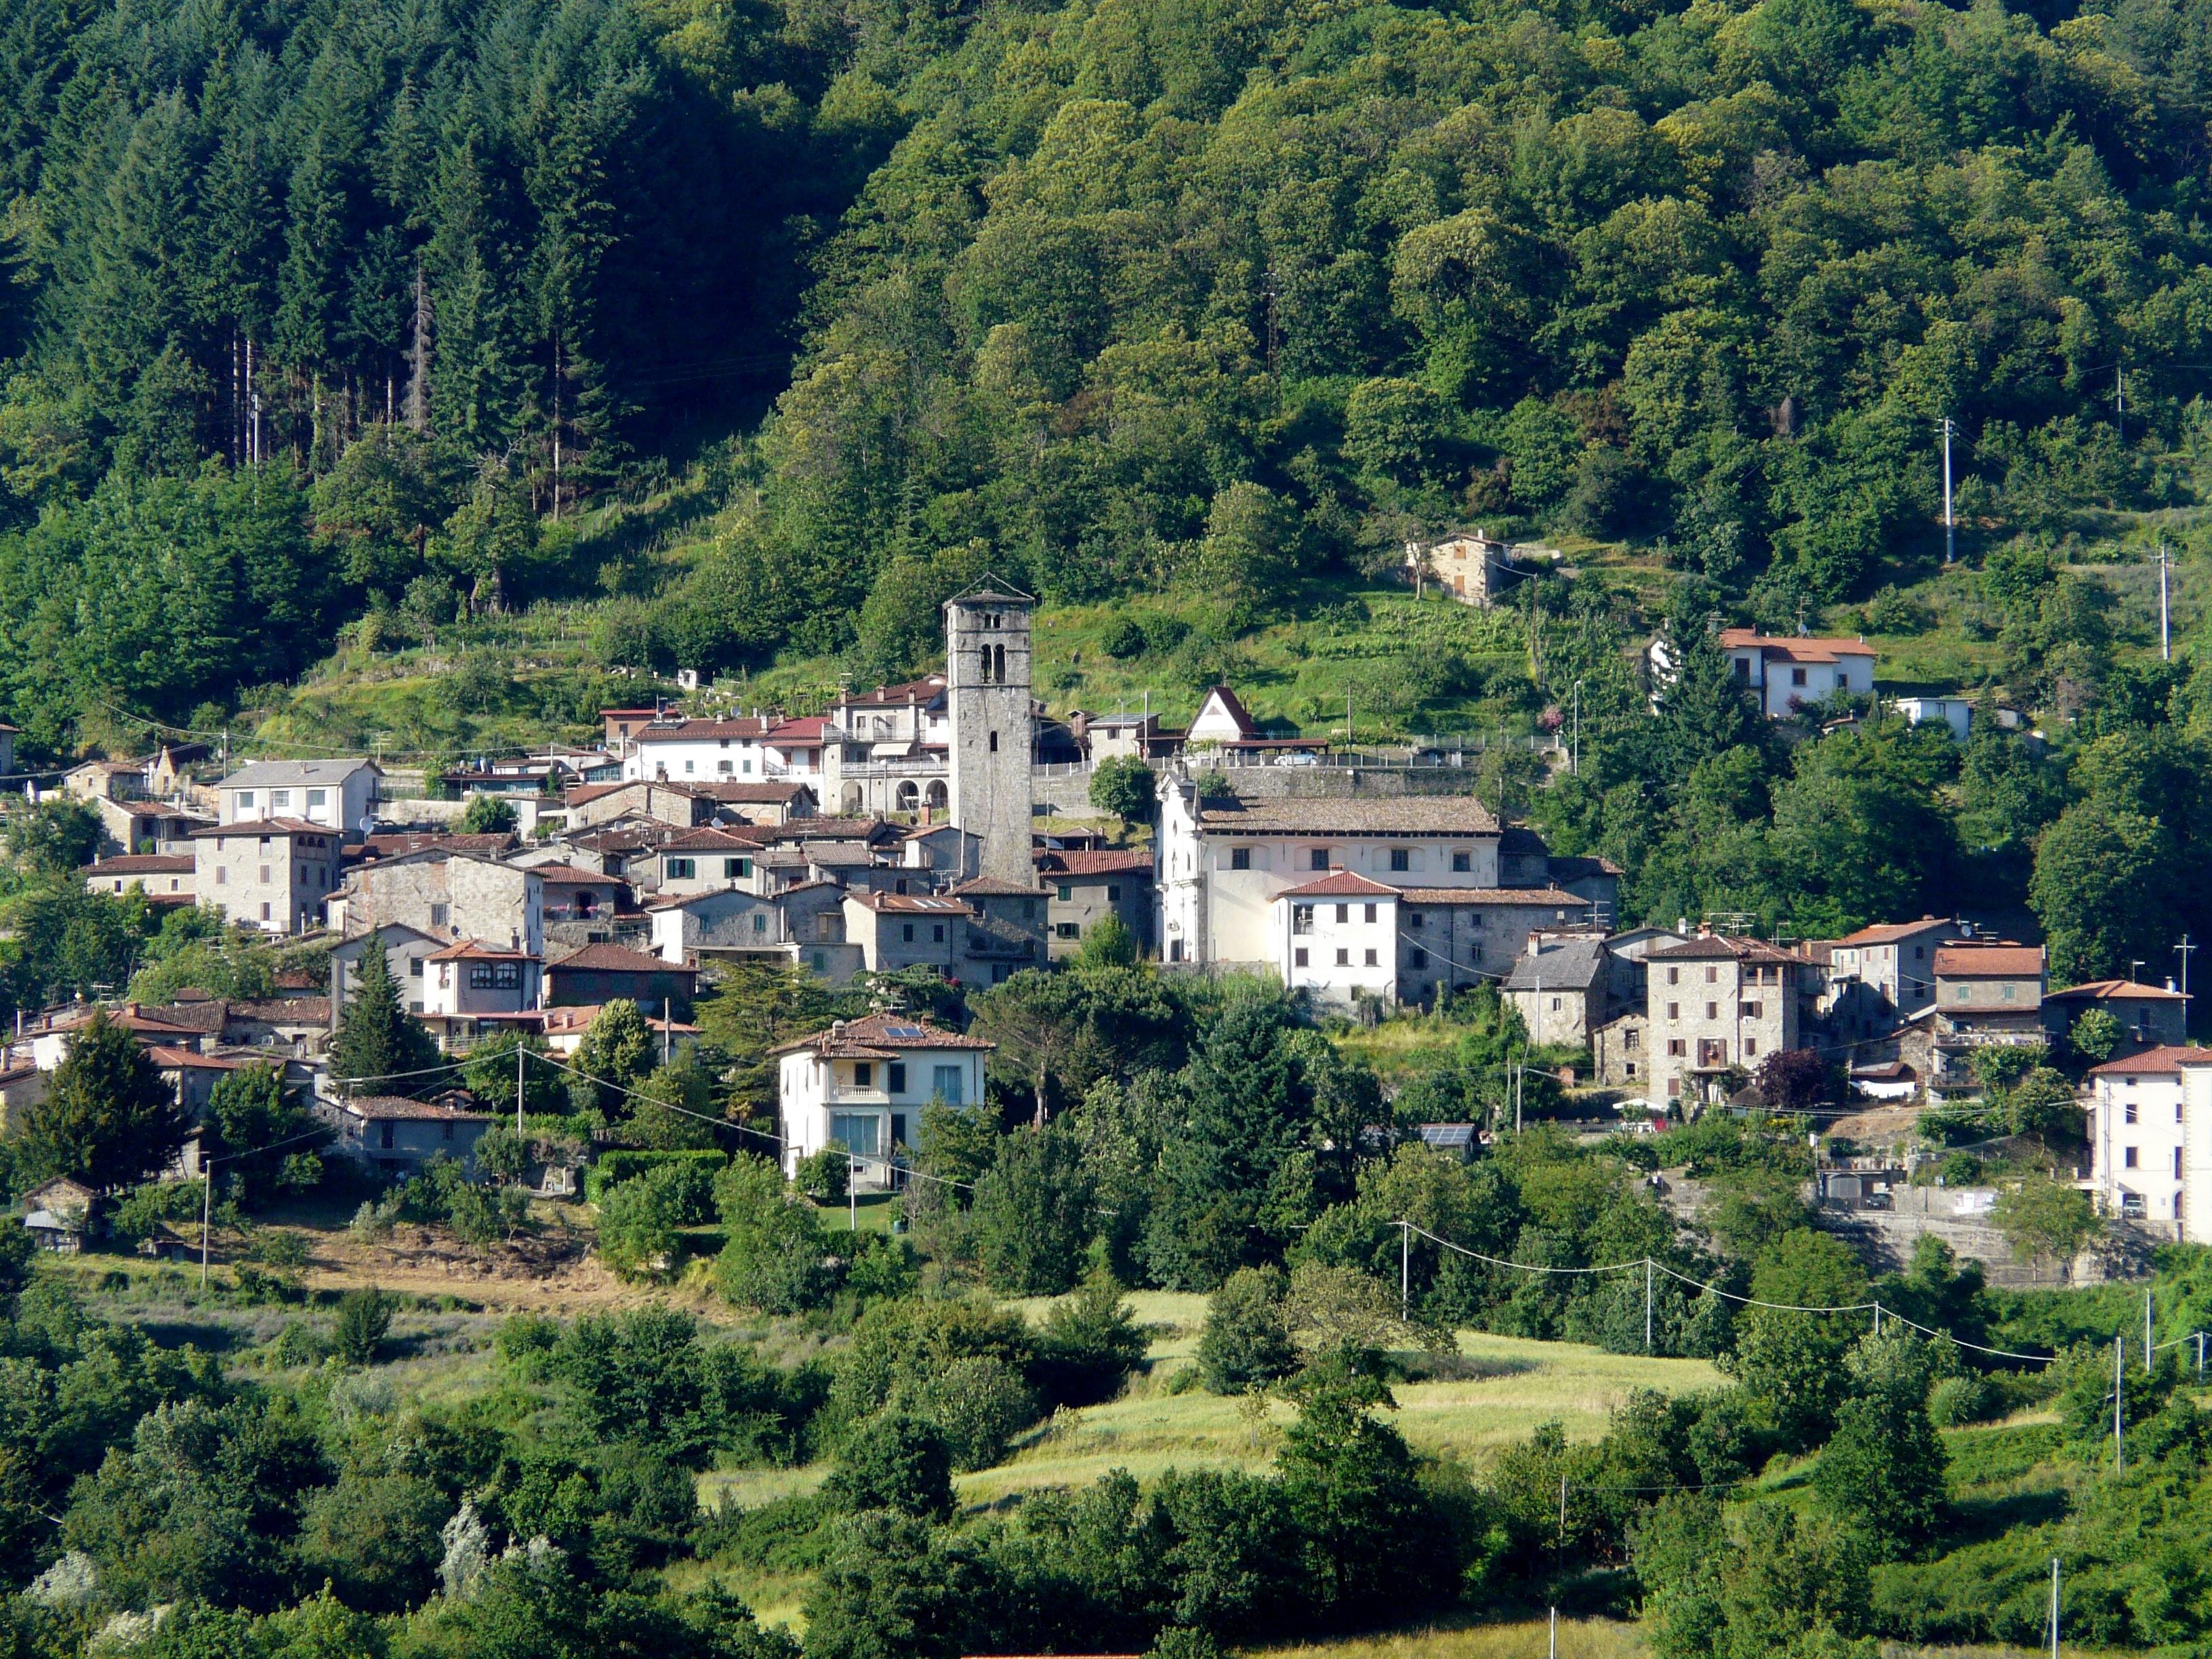 San_Romano_in_Garfagnana-panorama6